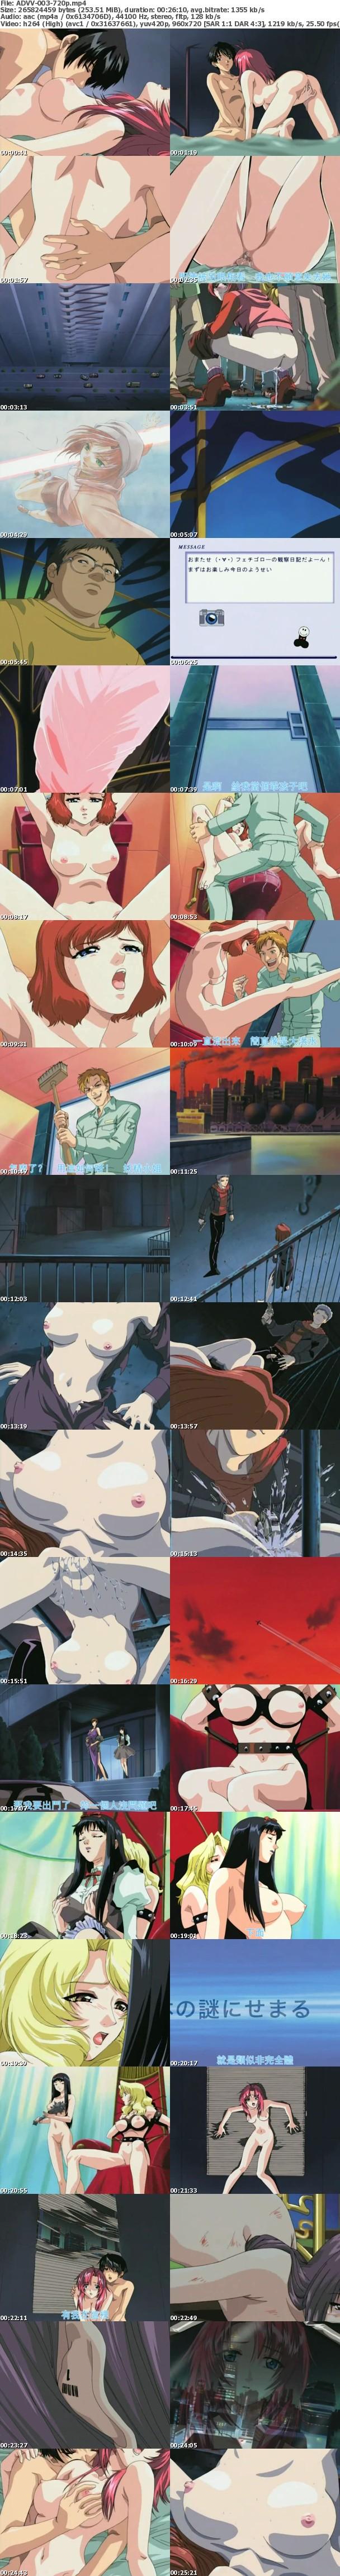 (HD) ADVV-003 ストラトスフェラの妖精 3